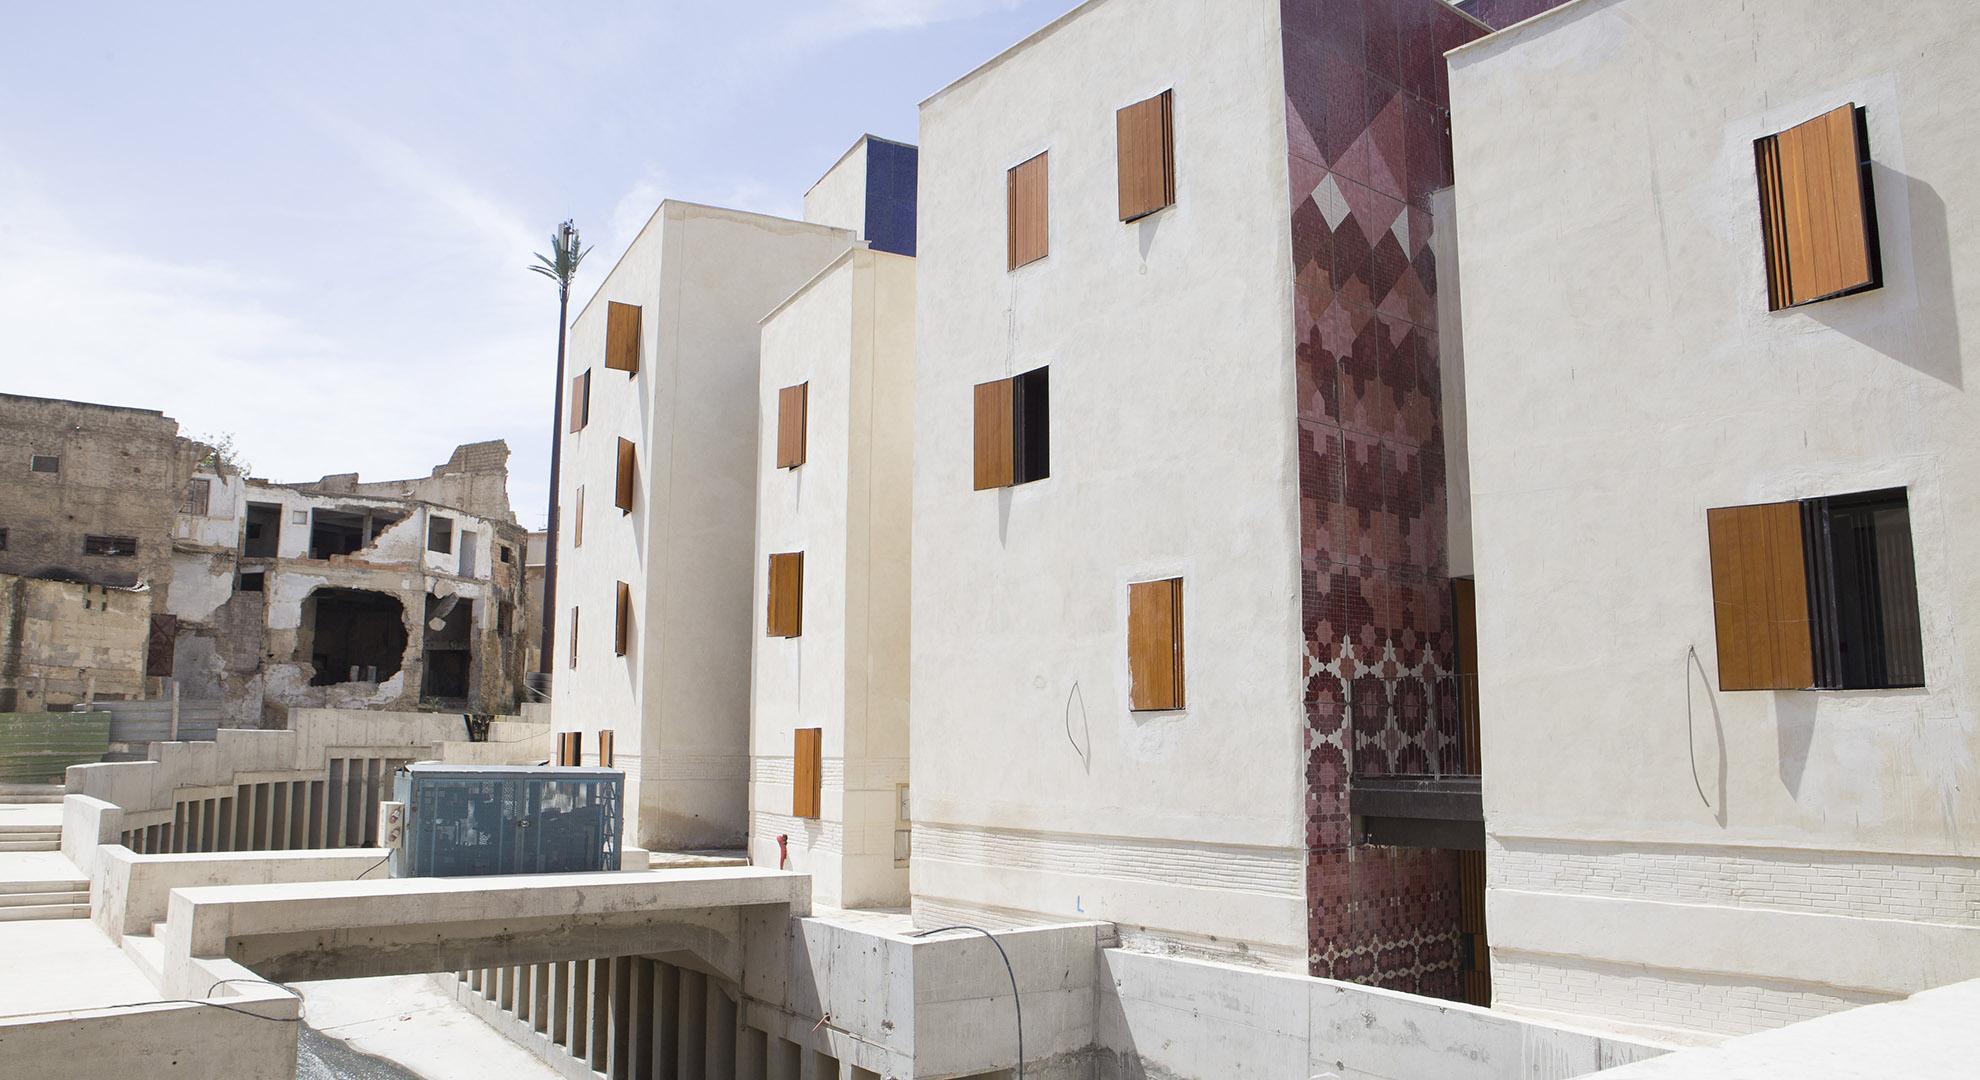 Lalla Yedounna square in Fez Medina